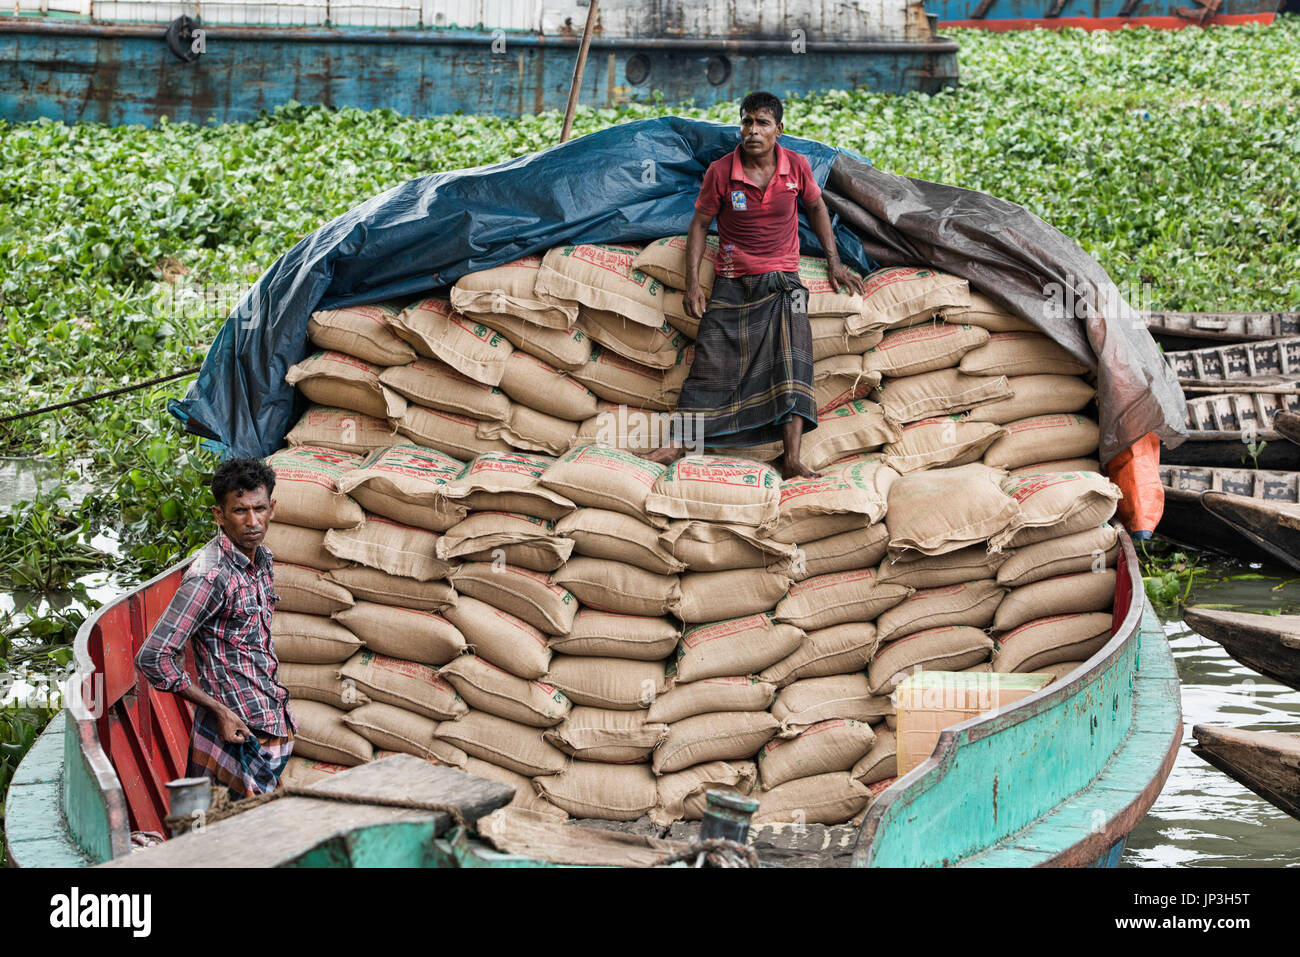 Manual labor at Saderghat on the Buriganga River, Dhaka, Bangladesh - Stock Image